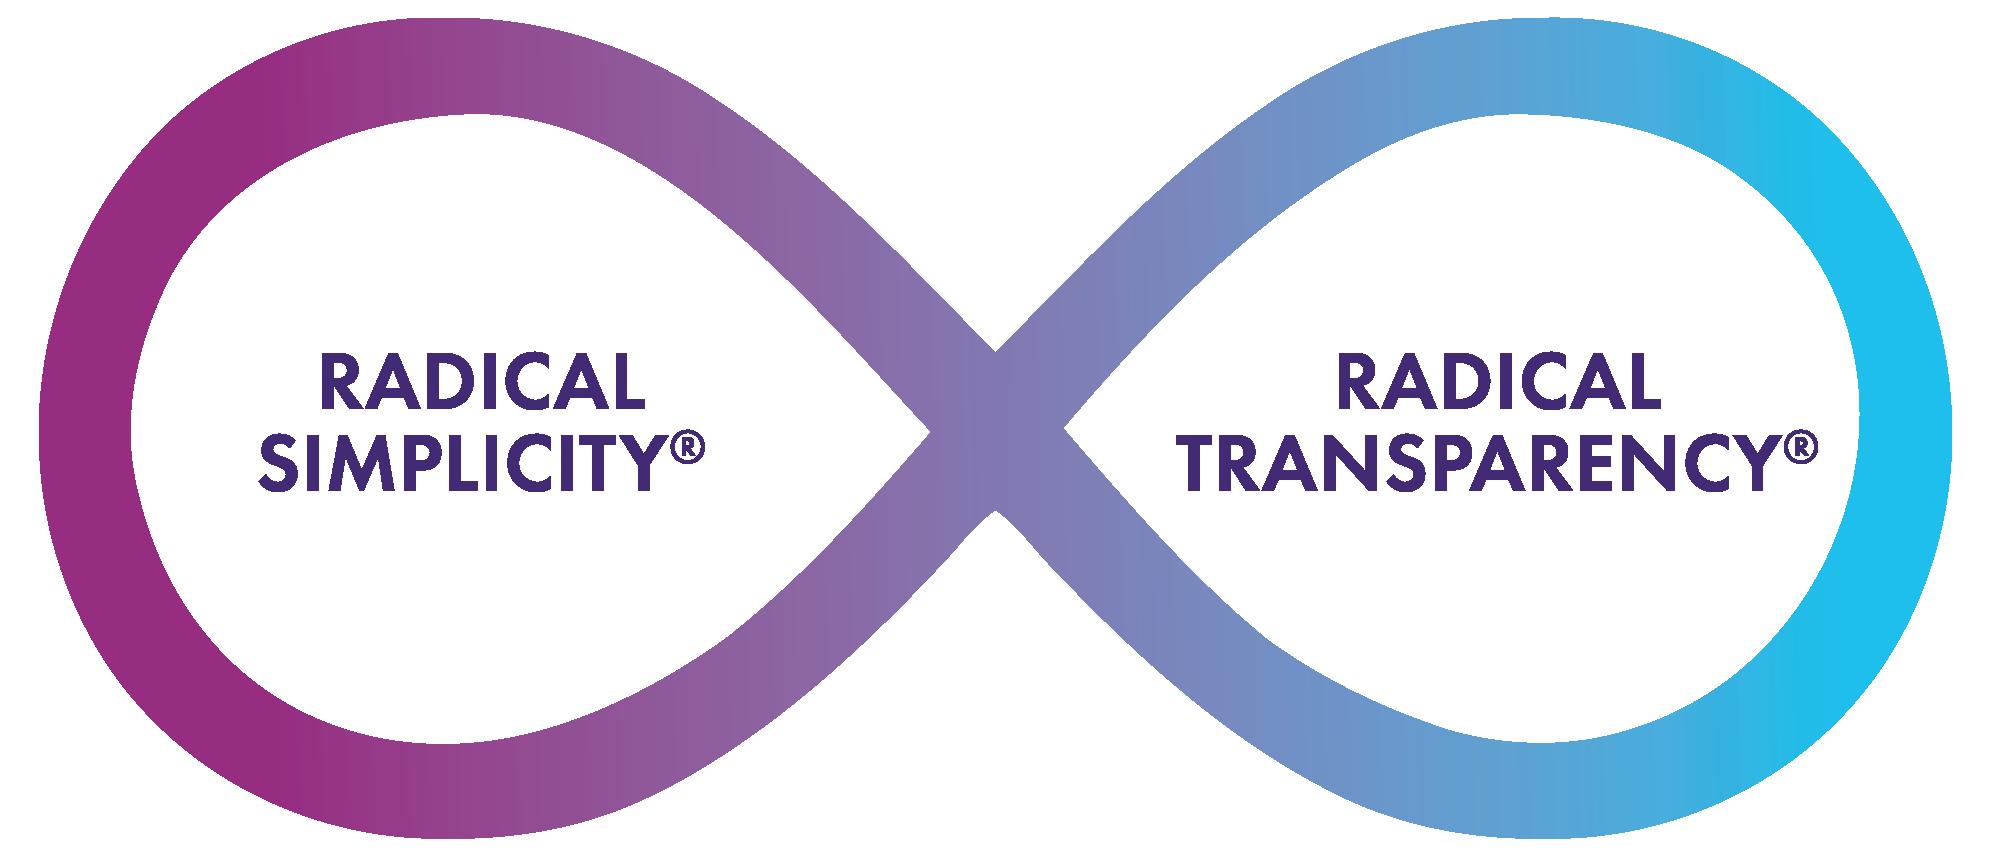 Radical Simplicity® + Radical Transparency®